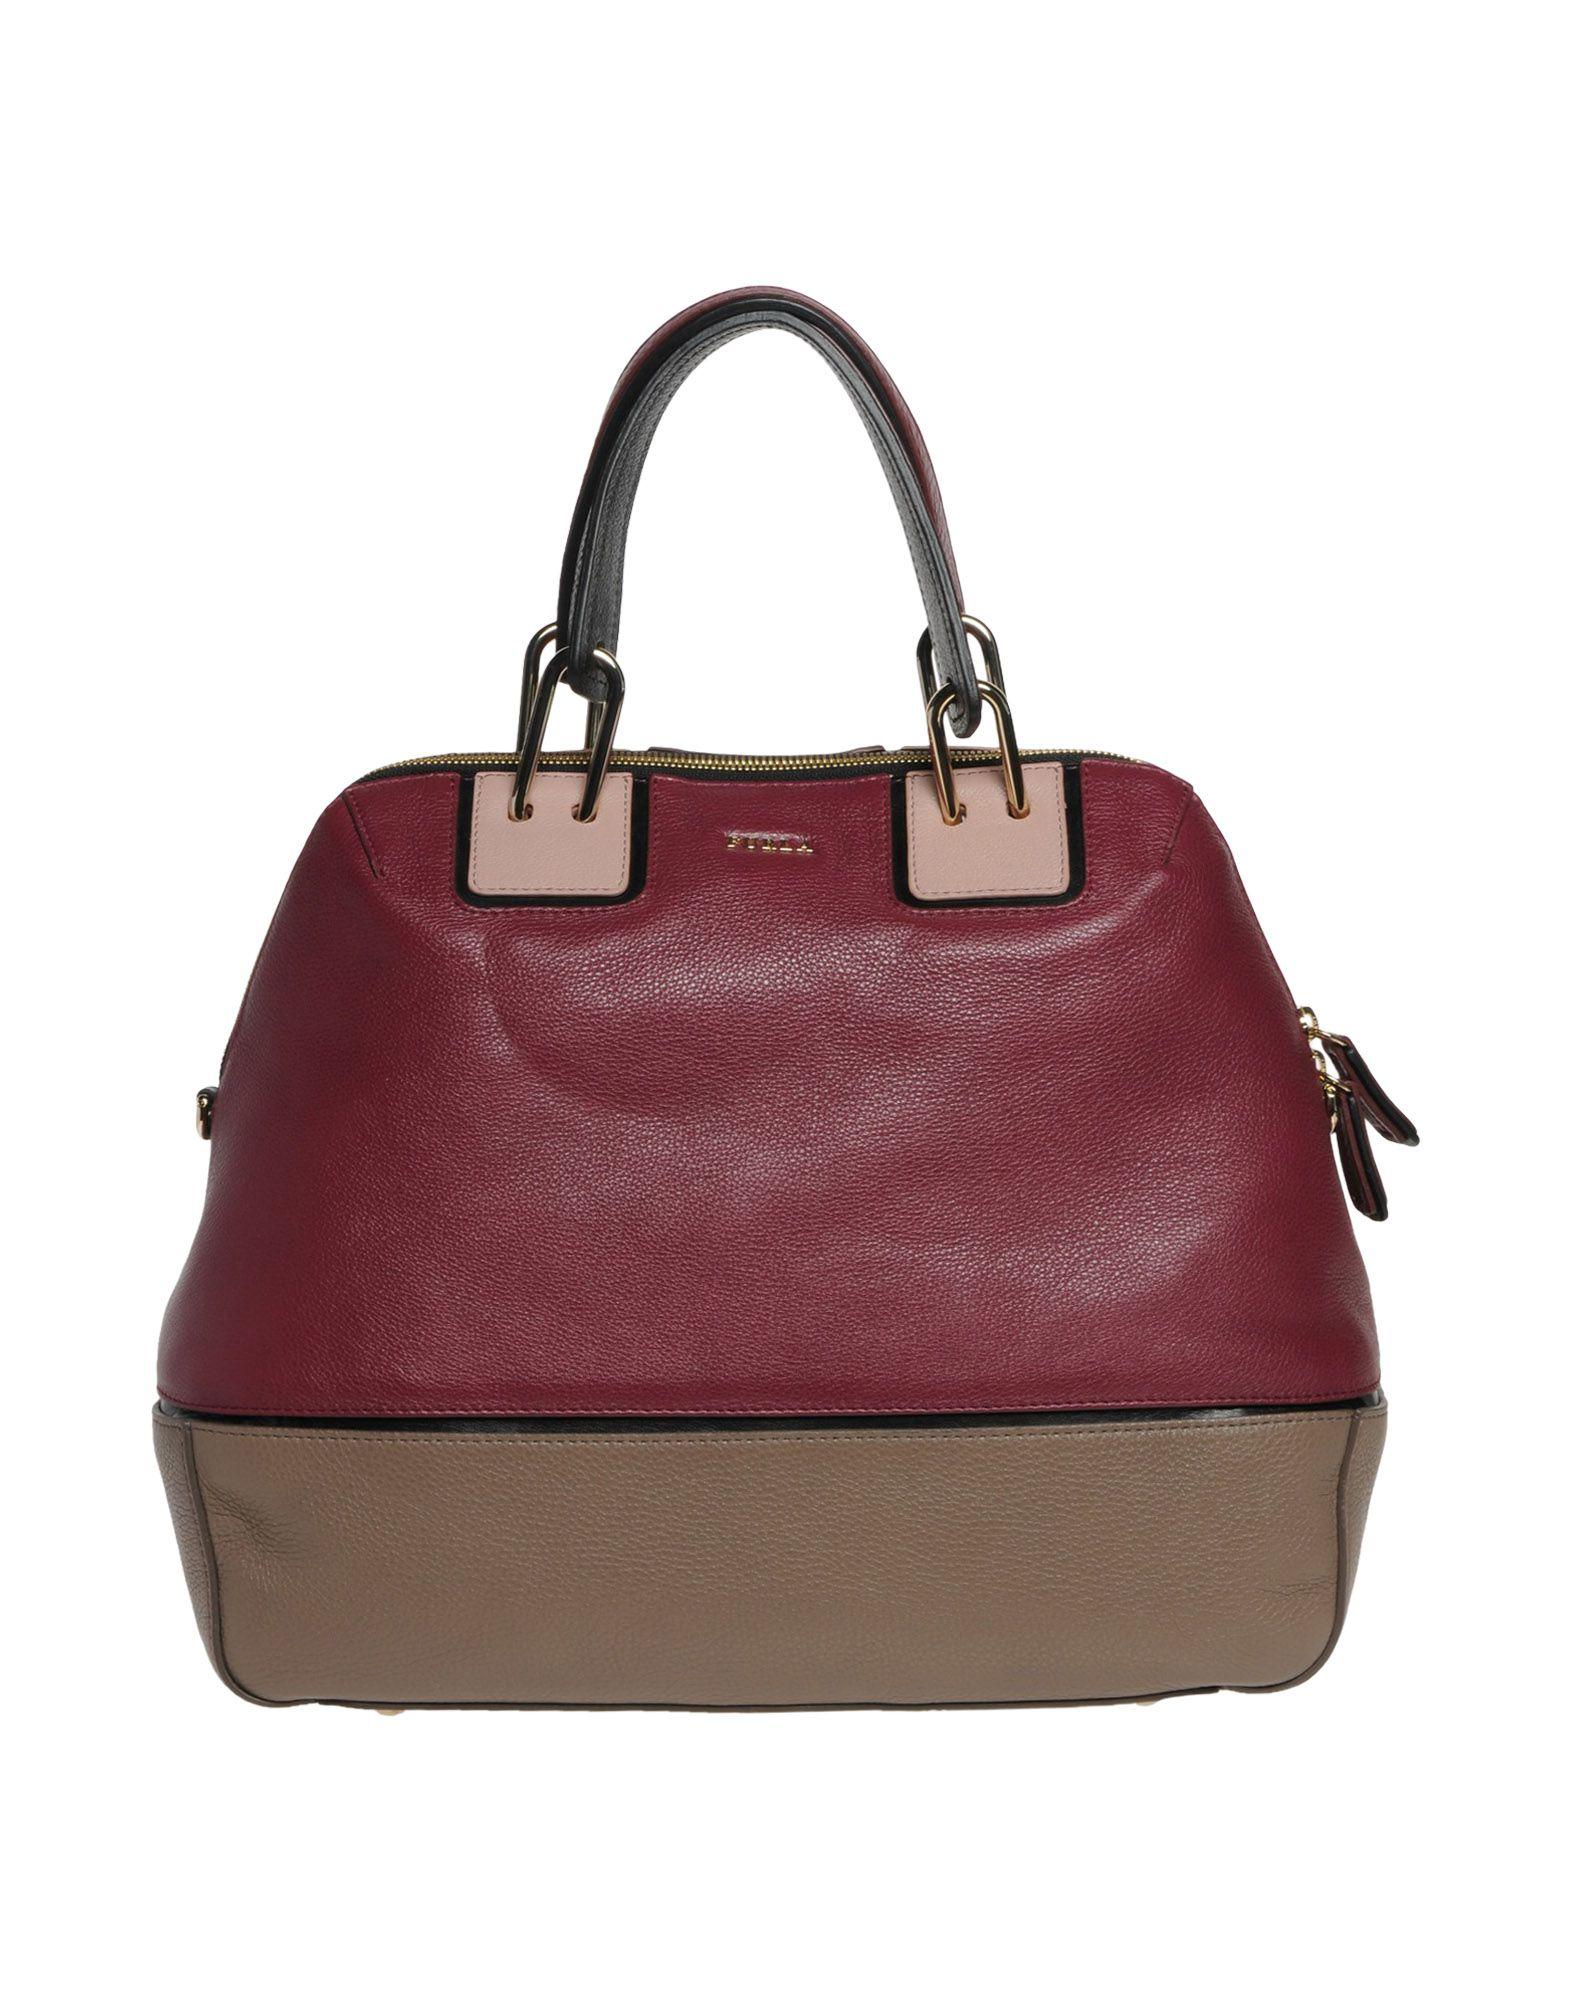 Furla Handbag in Purple (Maroon)